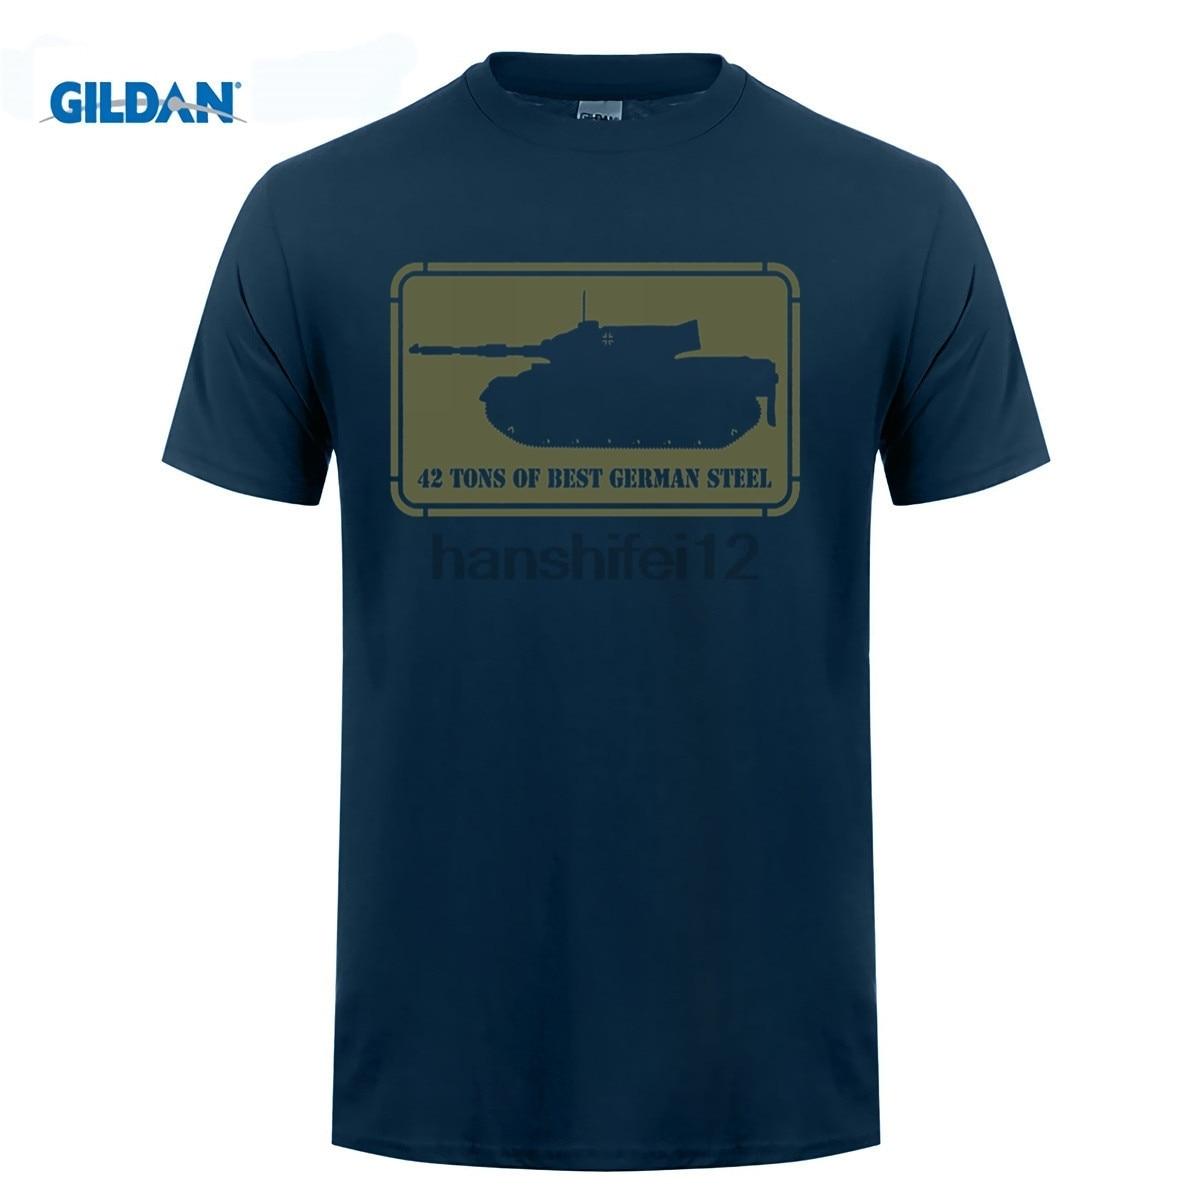 GILDAN designer t shirt Short Sleeve hD Print T Shirt Tank Leopard 1 A5 42 Tons Tons Tank Germany bob Marley Tee Shirts in T Shirts from Men 39 s Clothing